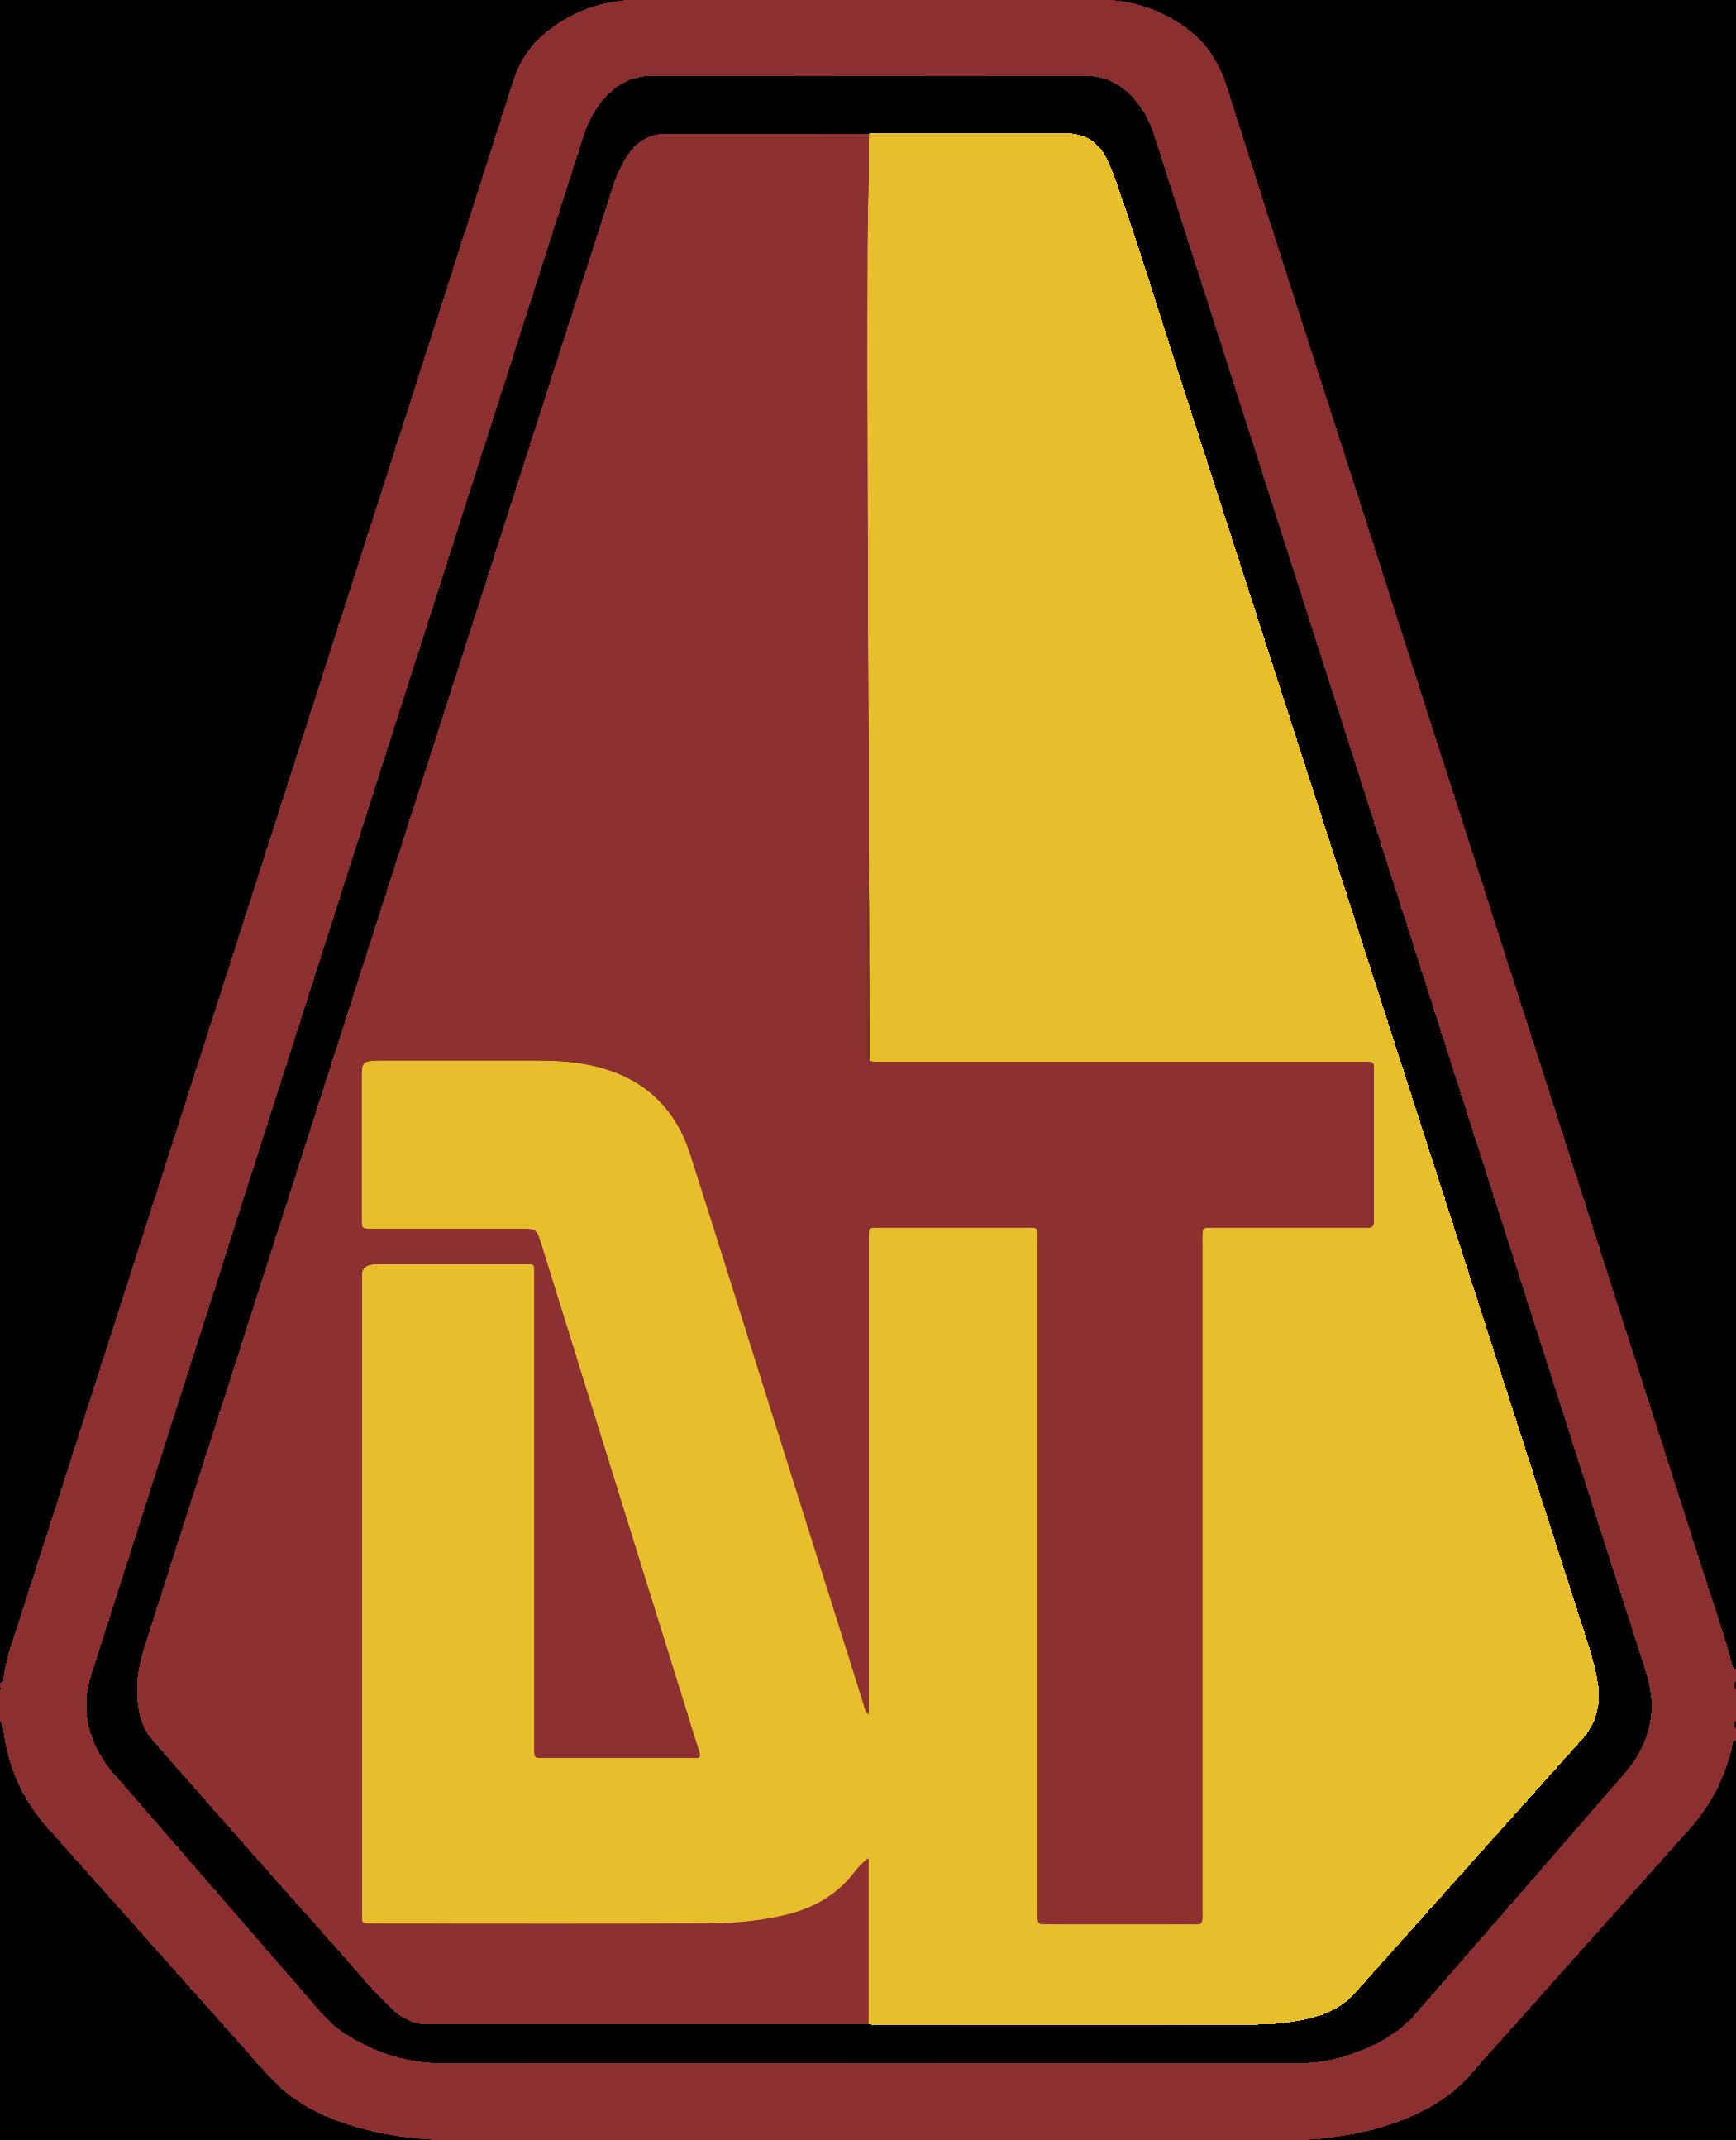 tolima-logo-escudo-1